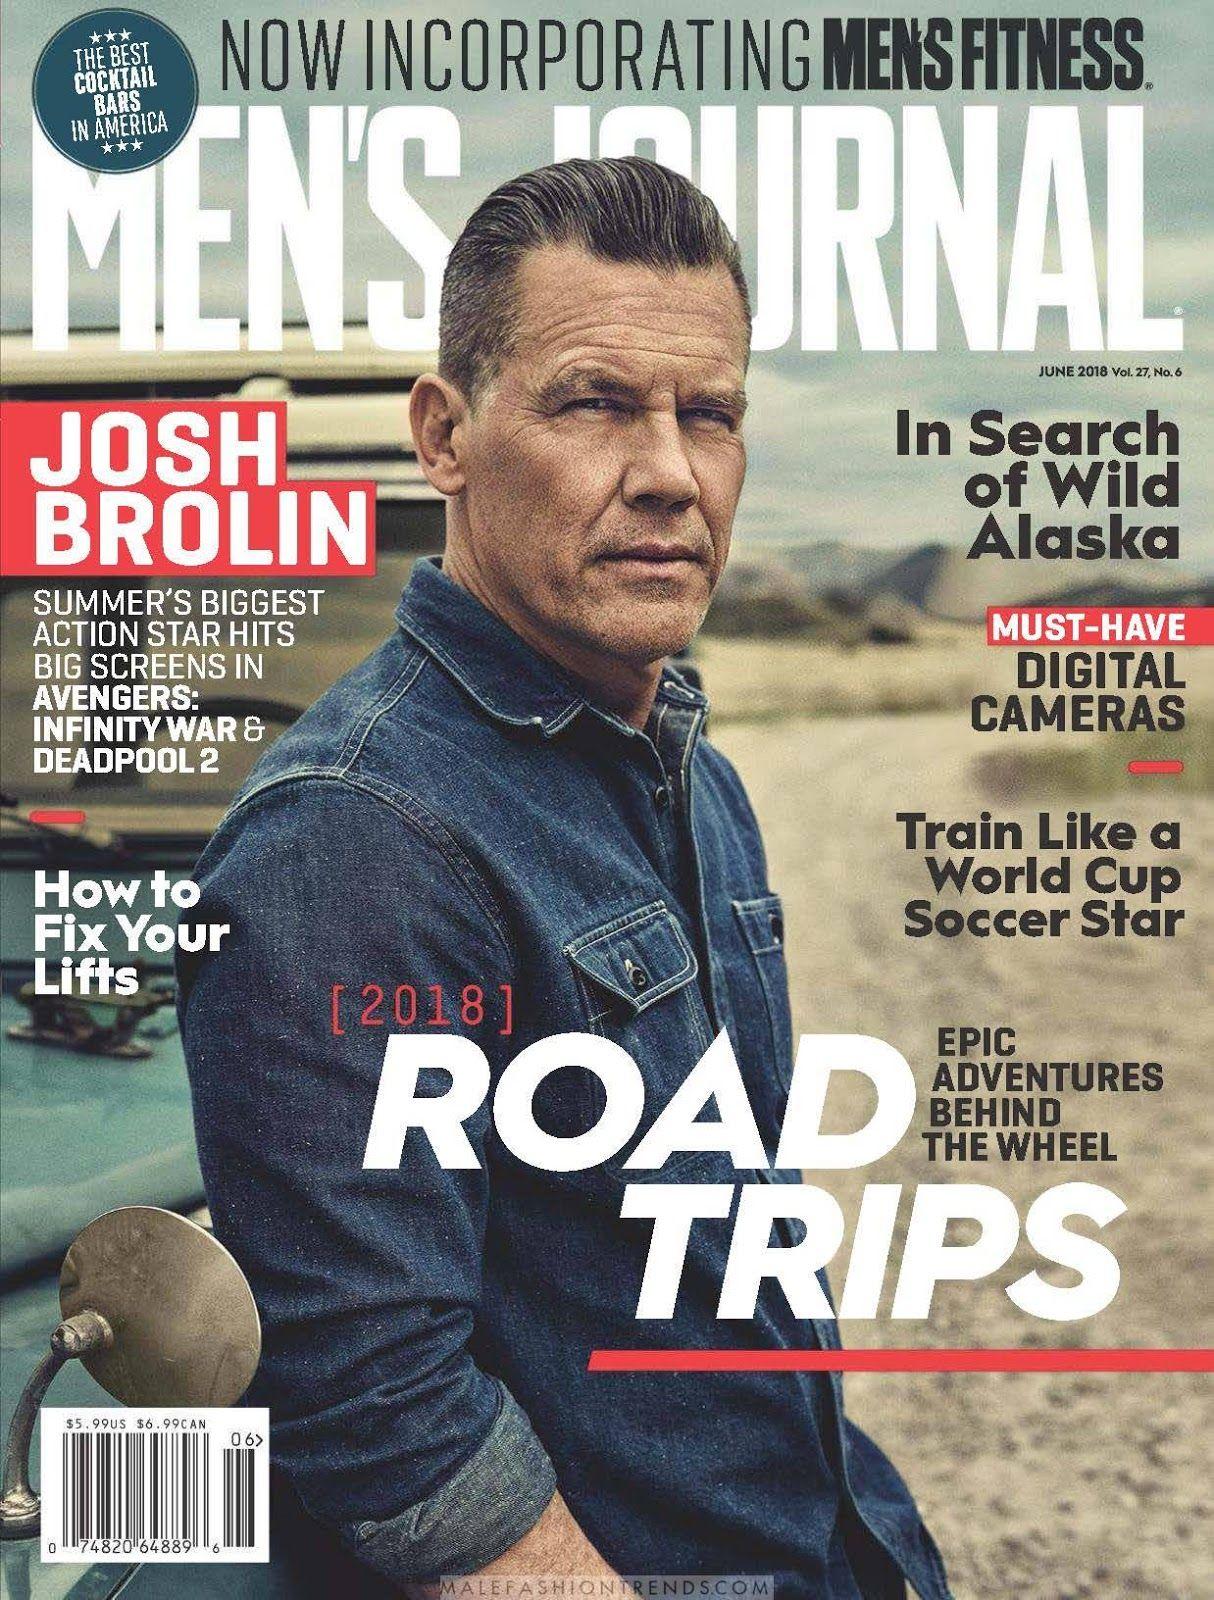 Josh Brolin for Mens Journal Magazine By Miller Mobley